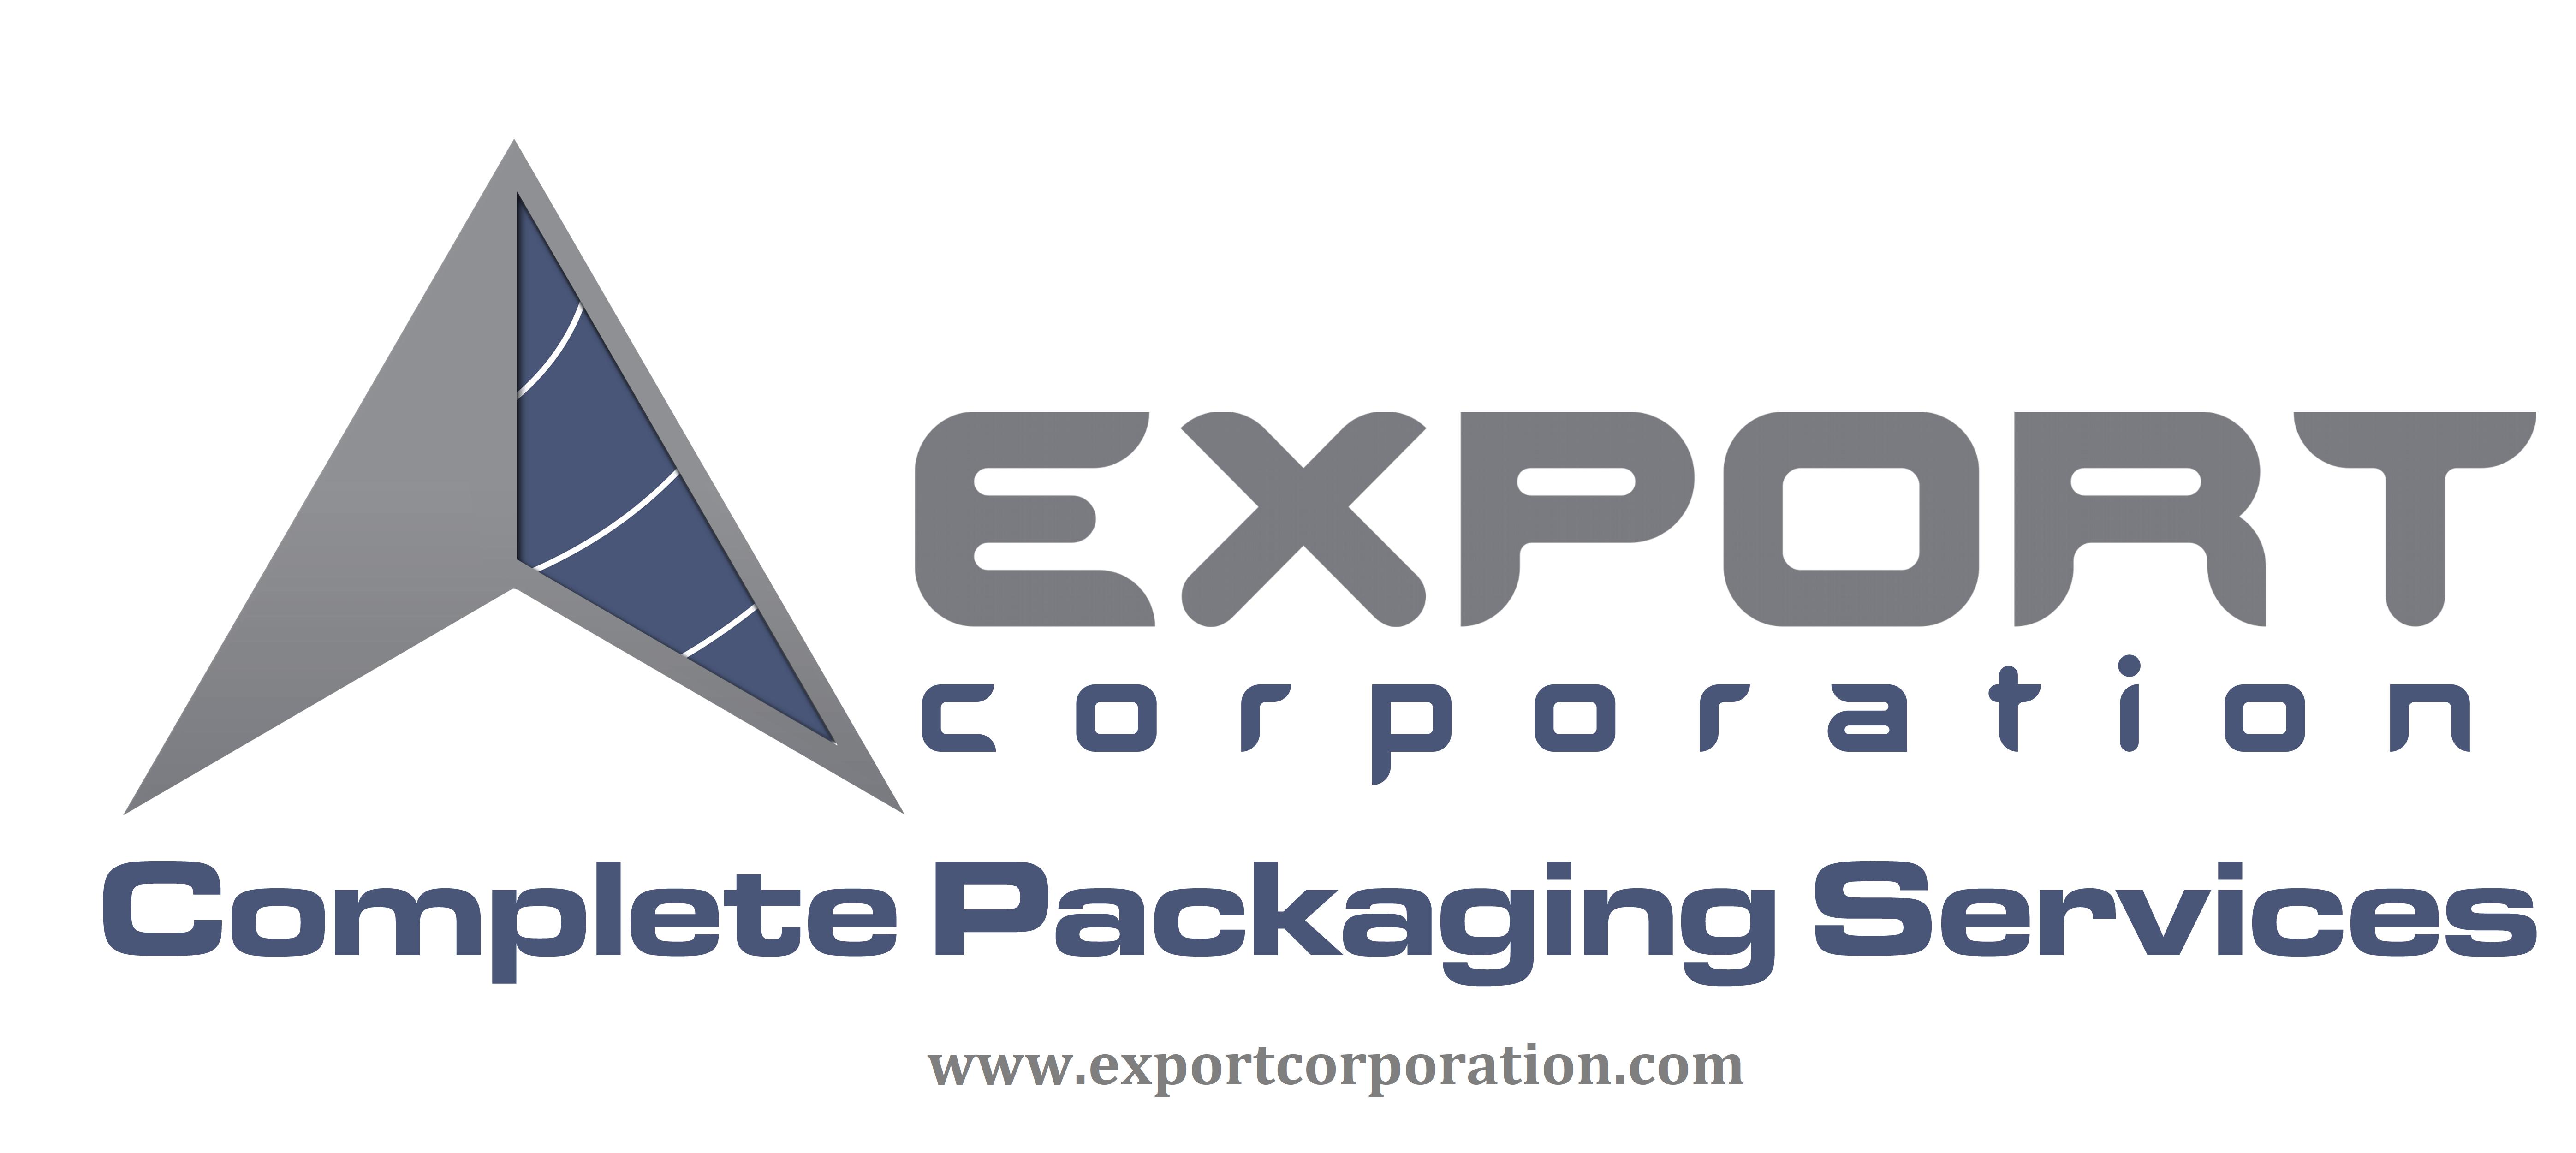 Export Corporation Logo - April 2020